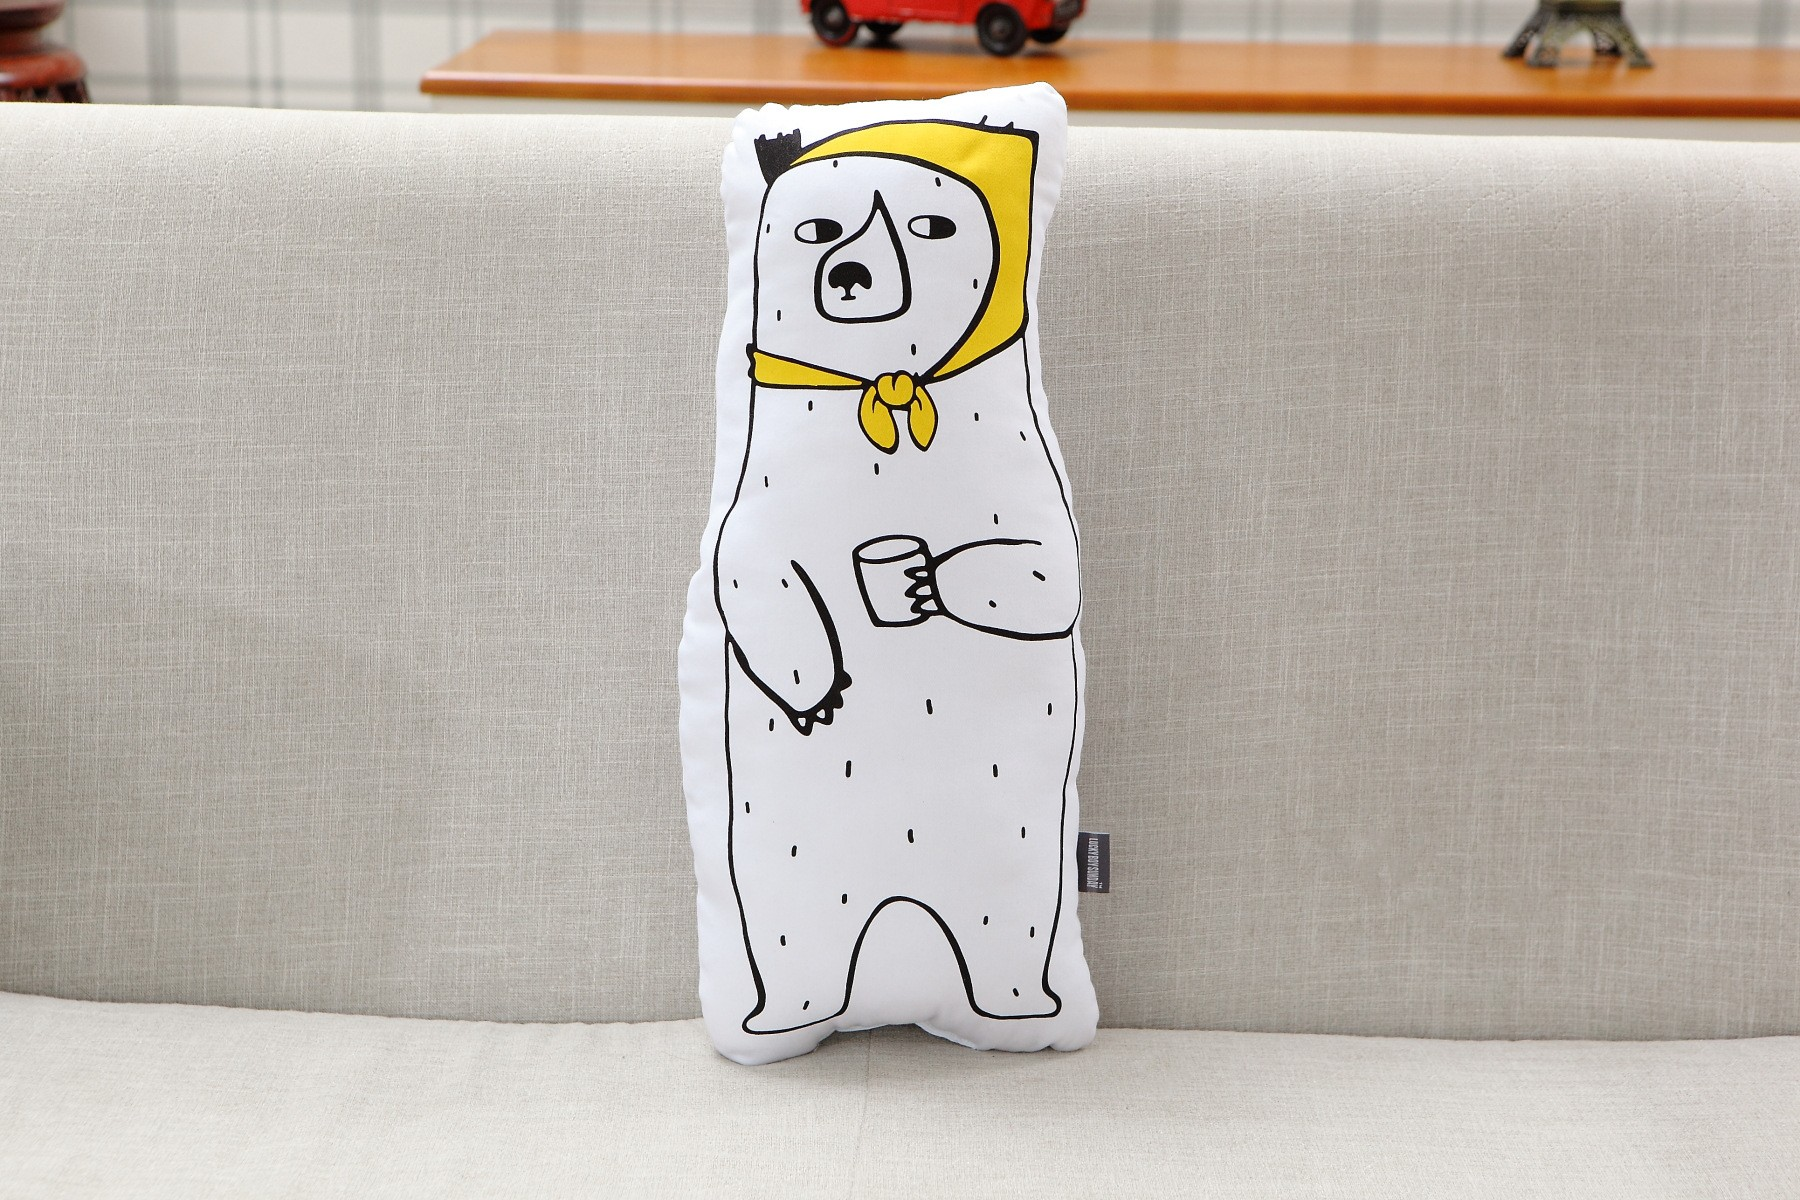 Calendário Escolar 2018 Y 2019 Word Más Arriba-a-fecha Cute Bear Ins 50 25cm Children Kids Bedroom toy Dolls sofa Car Seat